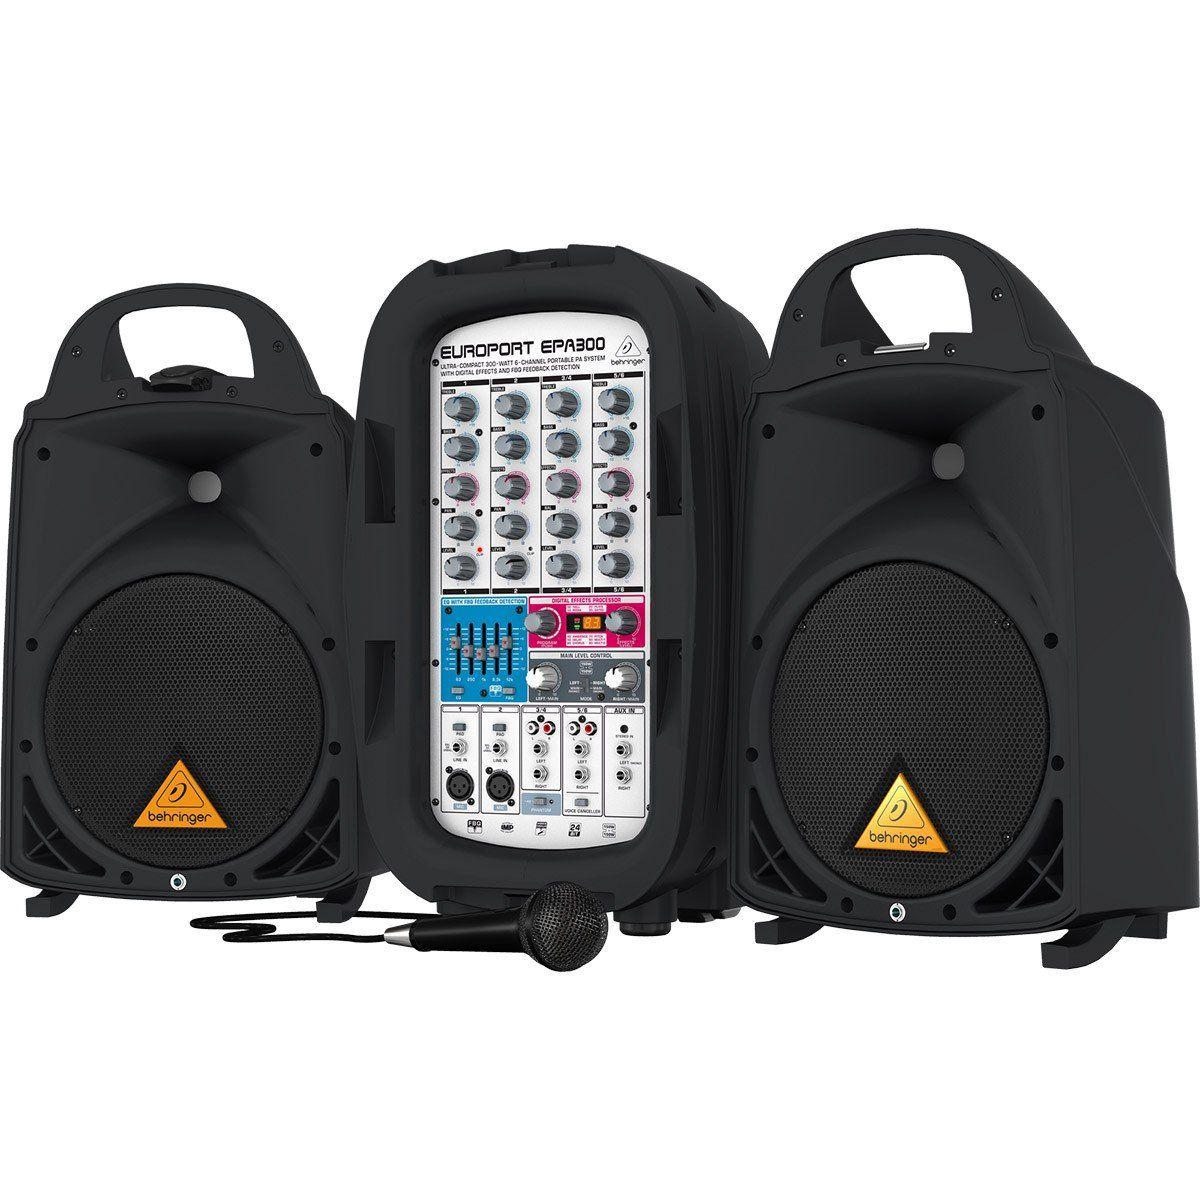 Behringer EuroPort EPA300 Caixa de Som Behringer Kit de Pa 300w com Mixer e Microfone